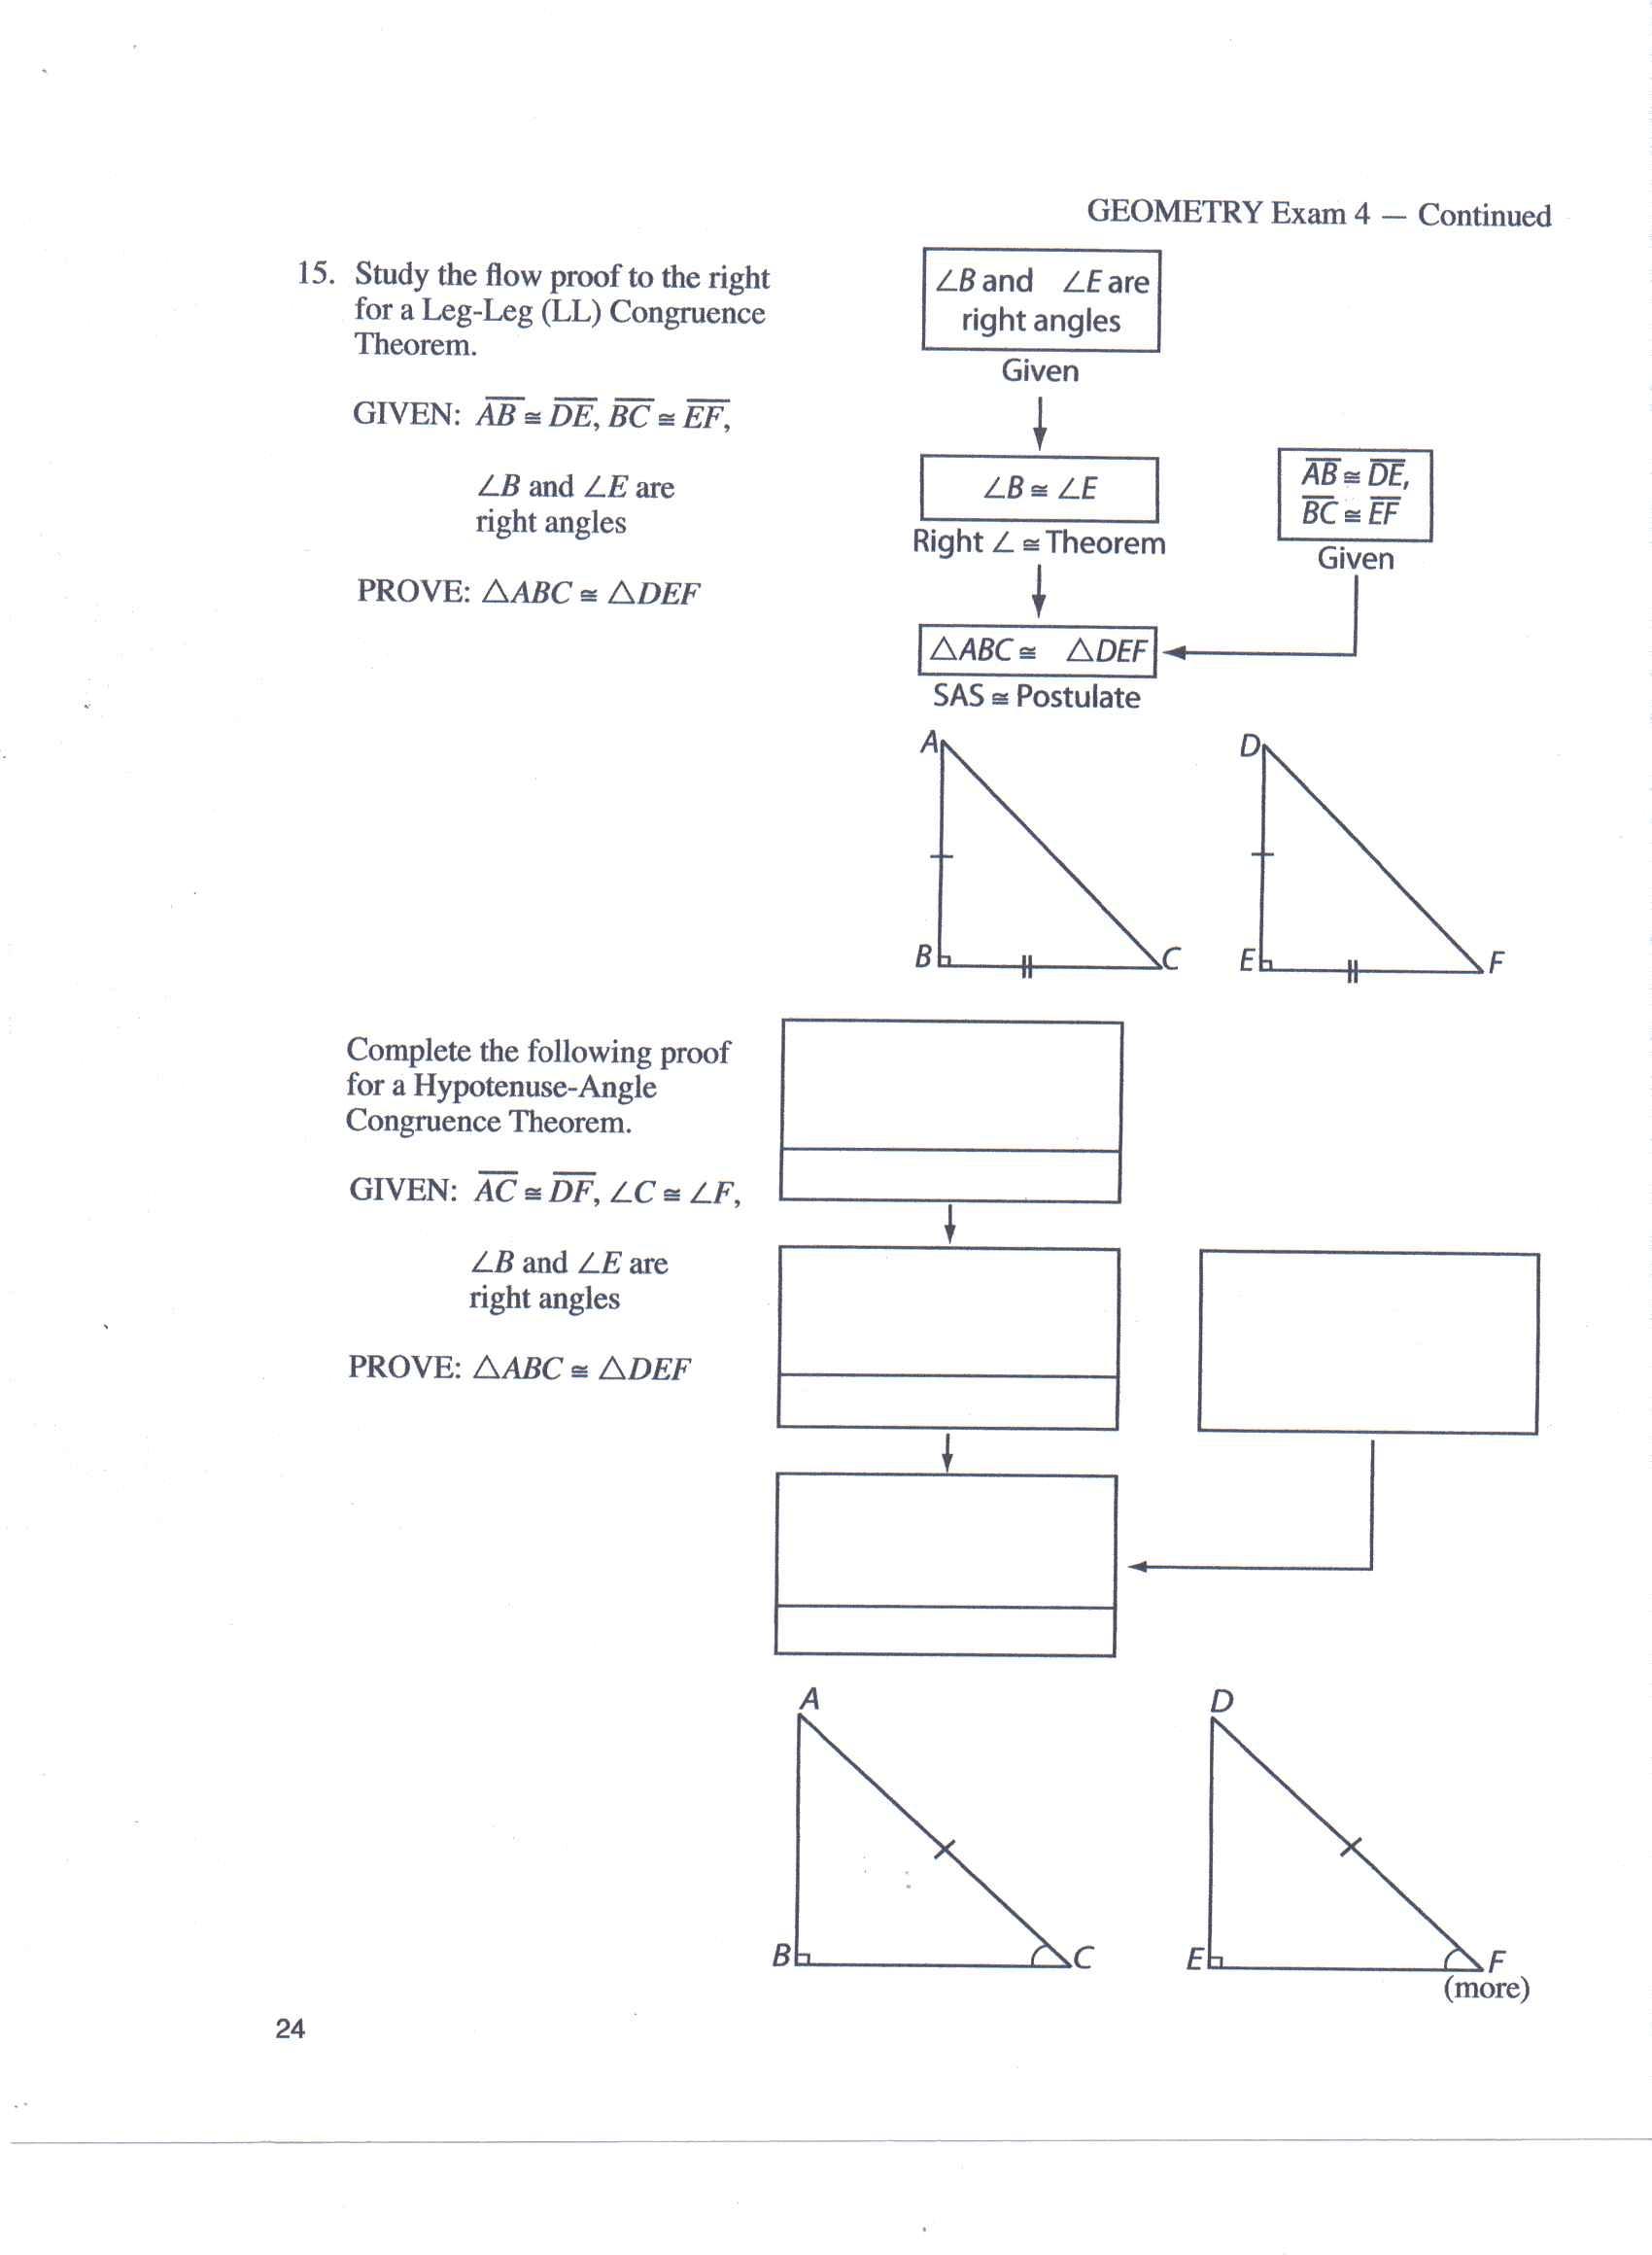 Geometry Homework Help Proofs Answers